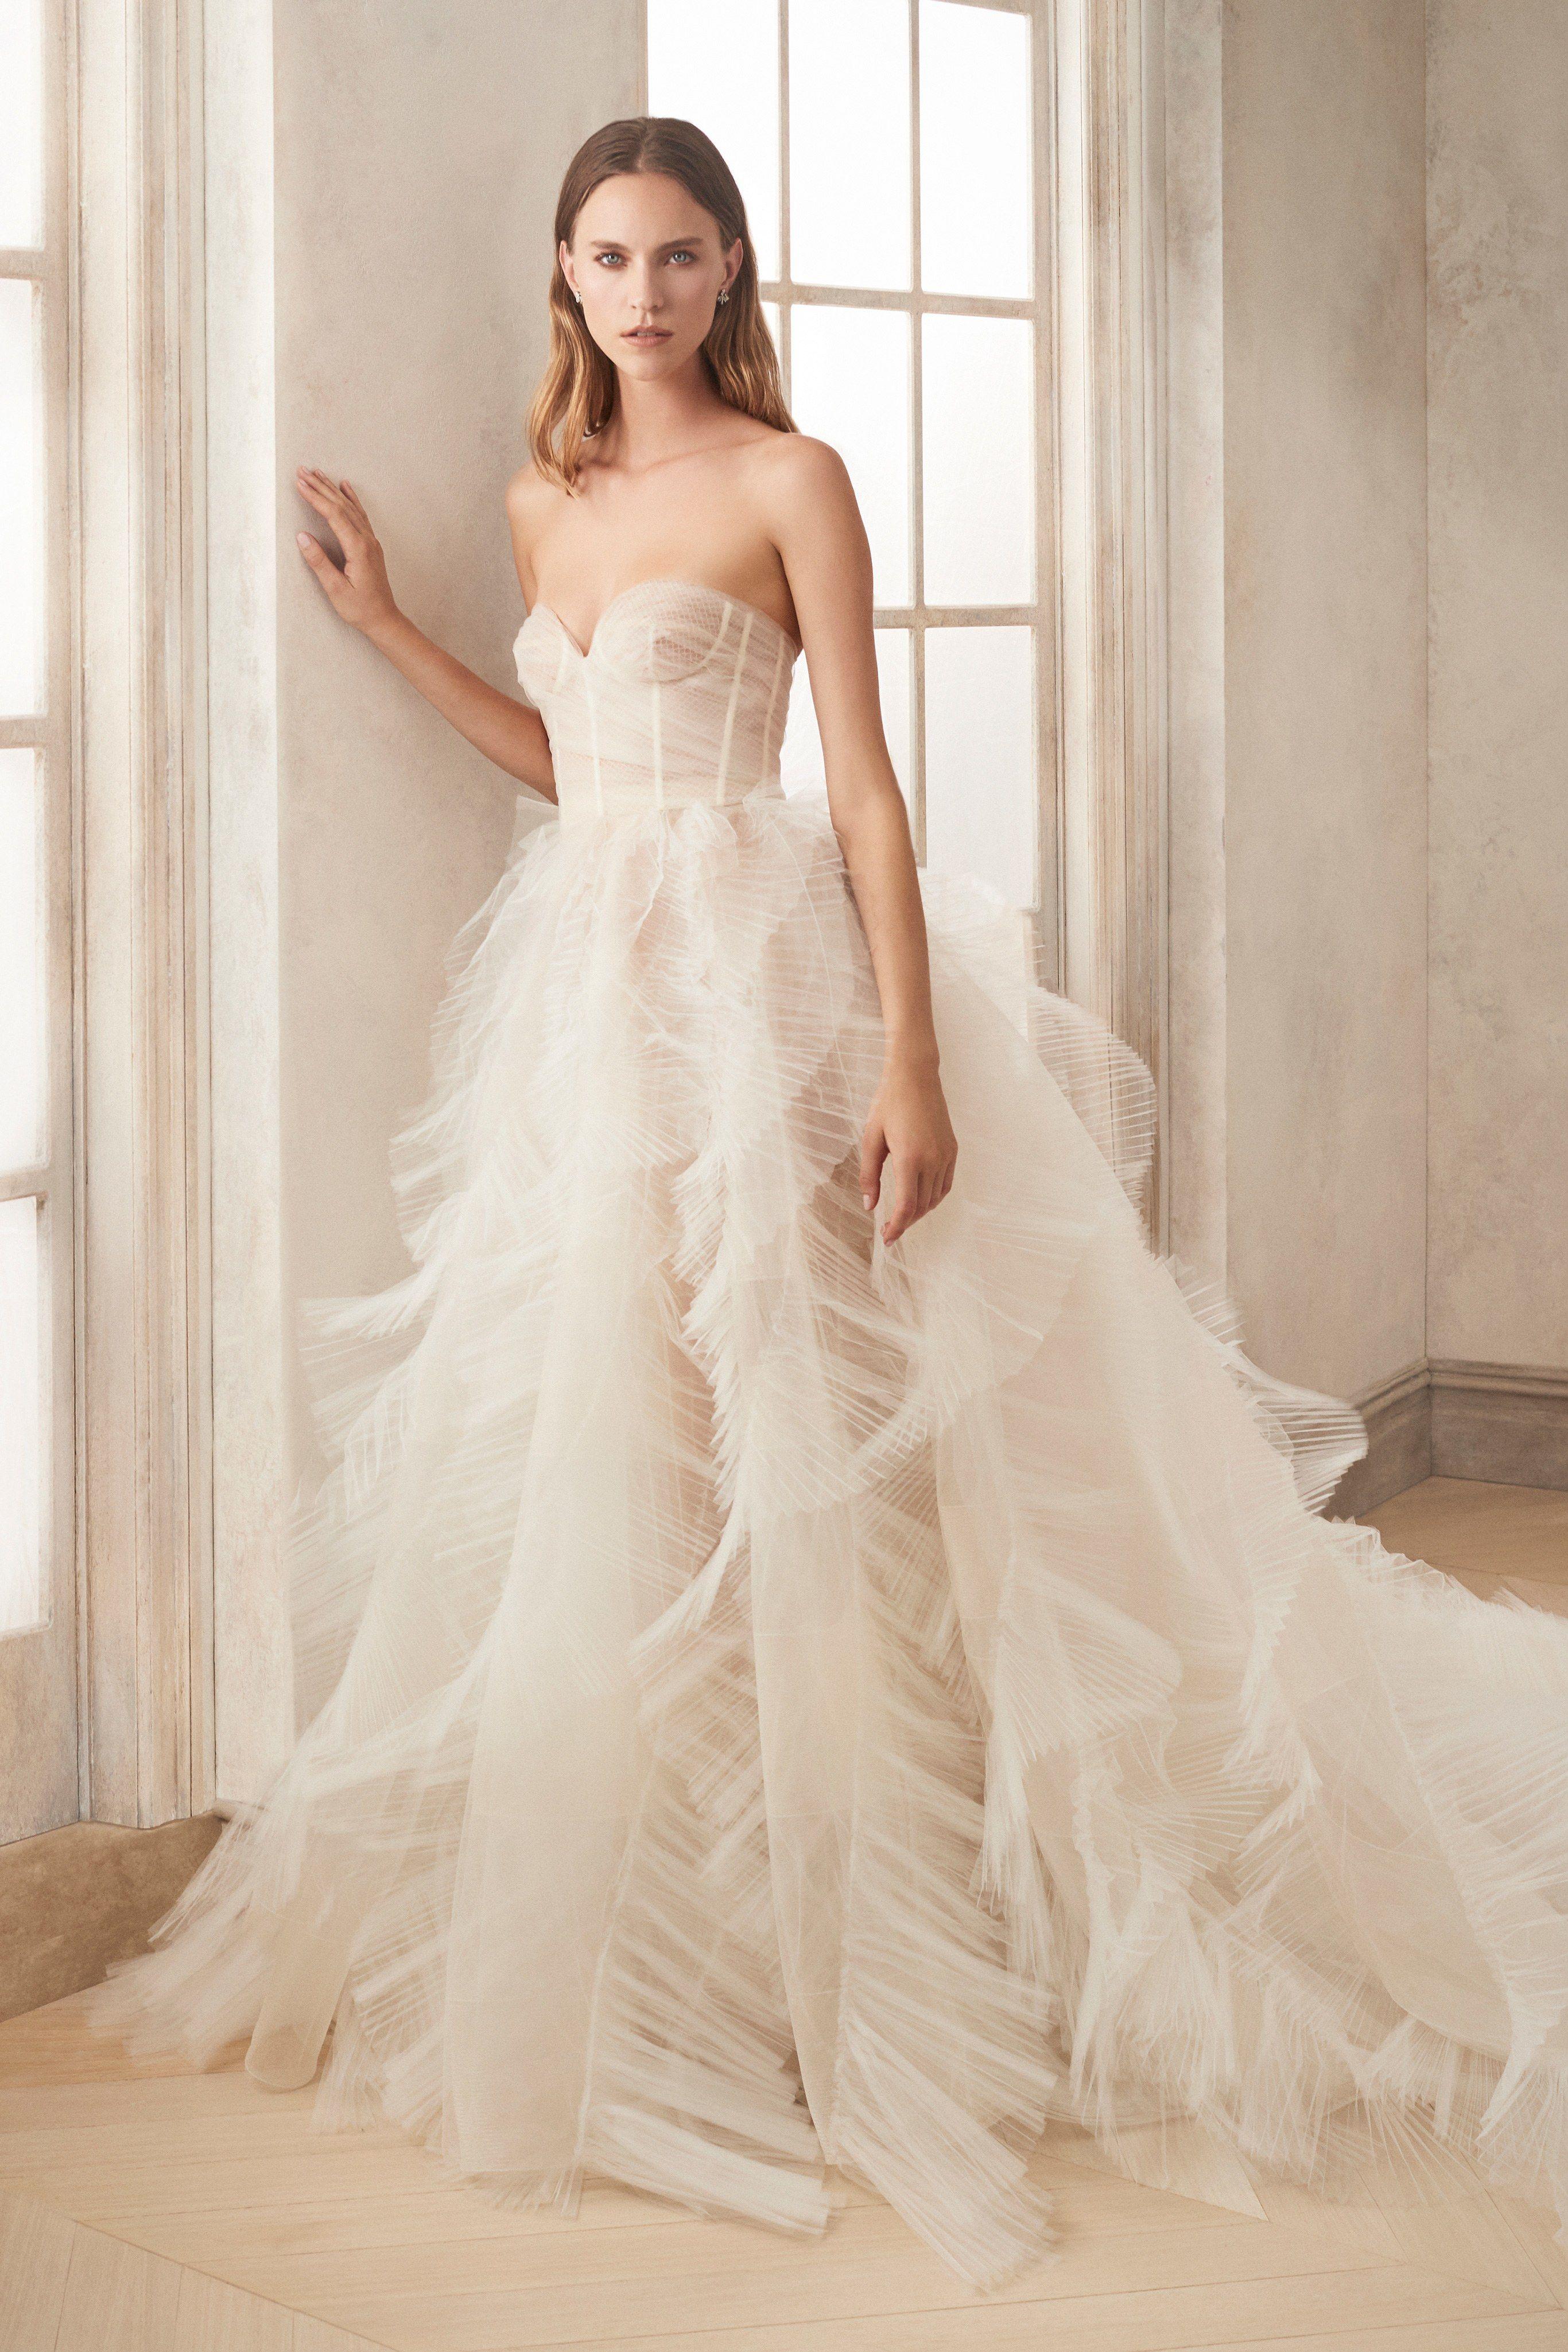 Fall Dresses 2020.Best Wedding Dresses Fall 2020 Top Autumn Bridal Runway Looks